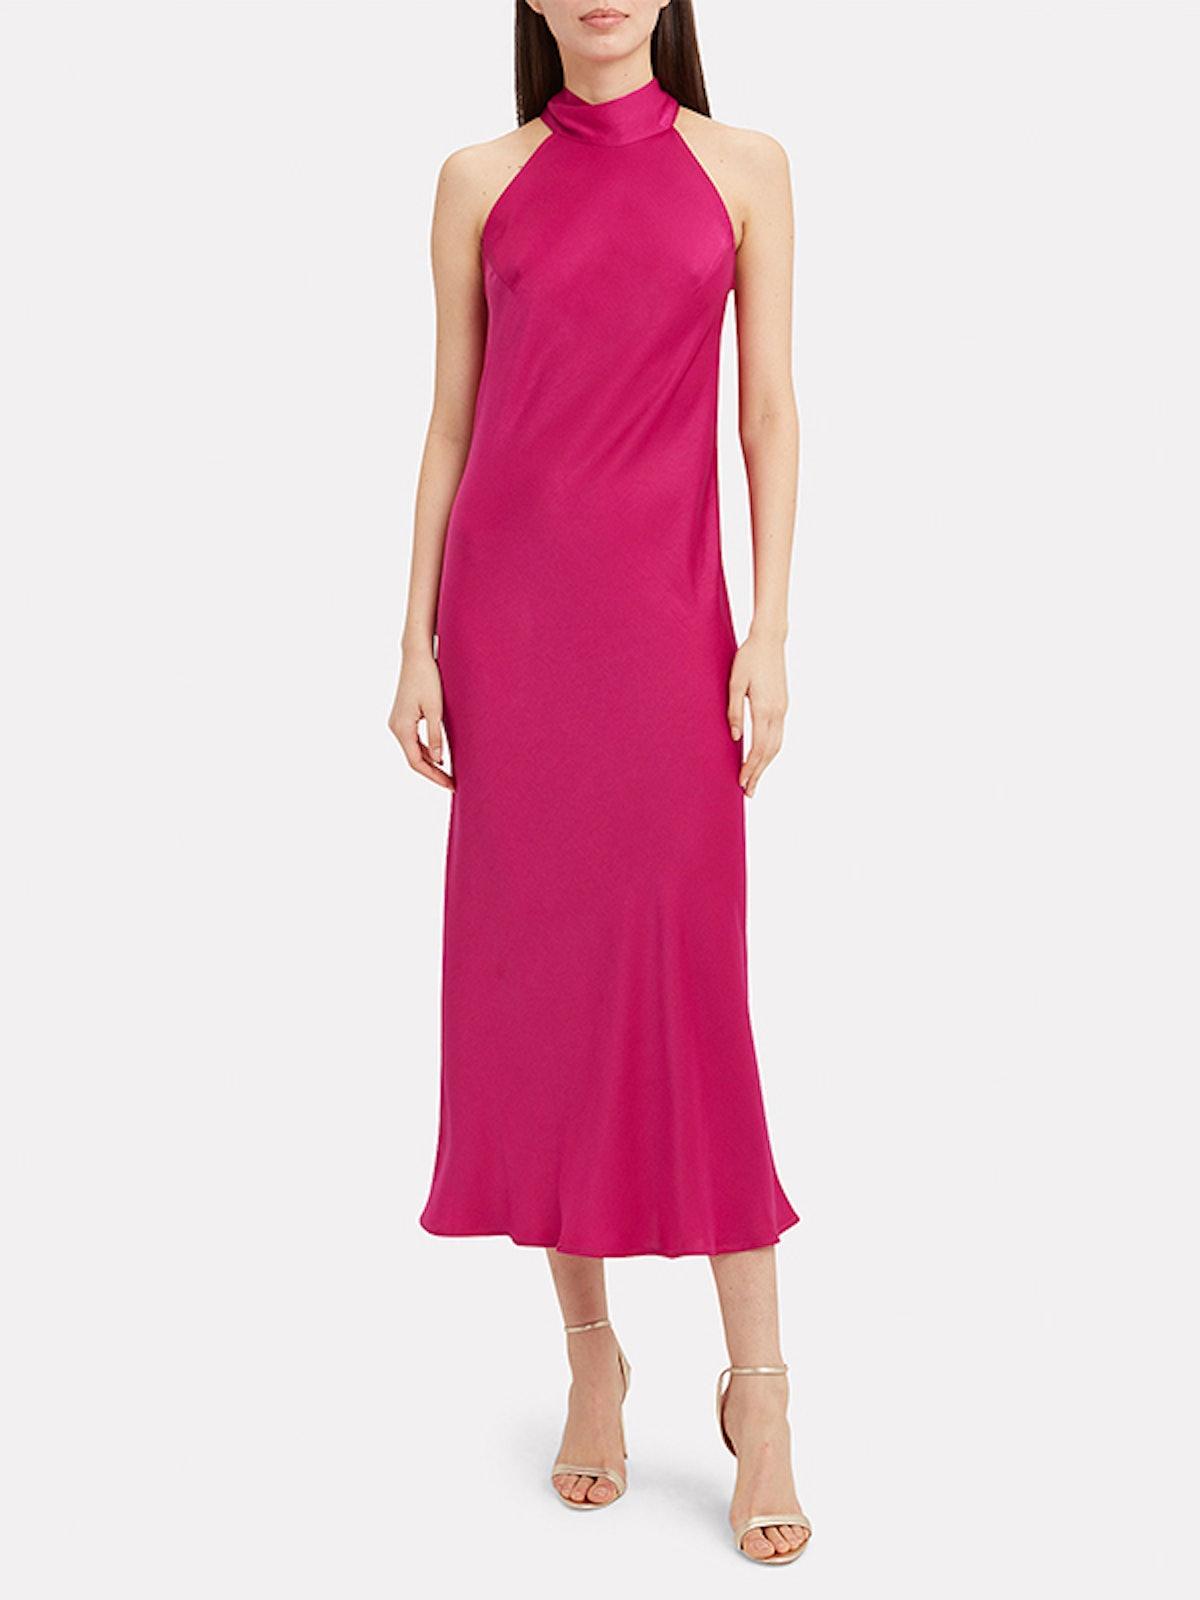 Sienna Satin Midi Dress